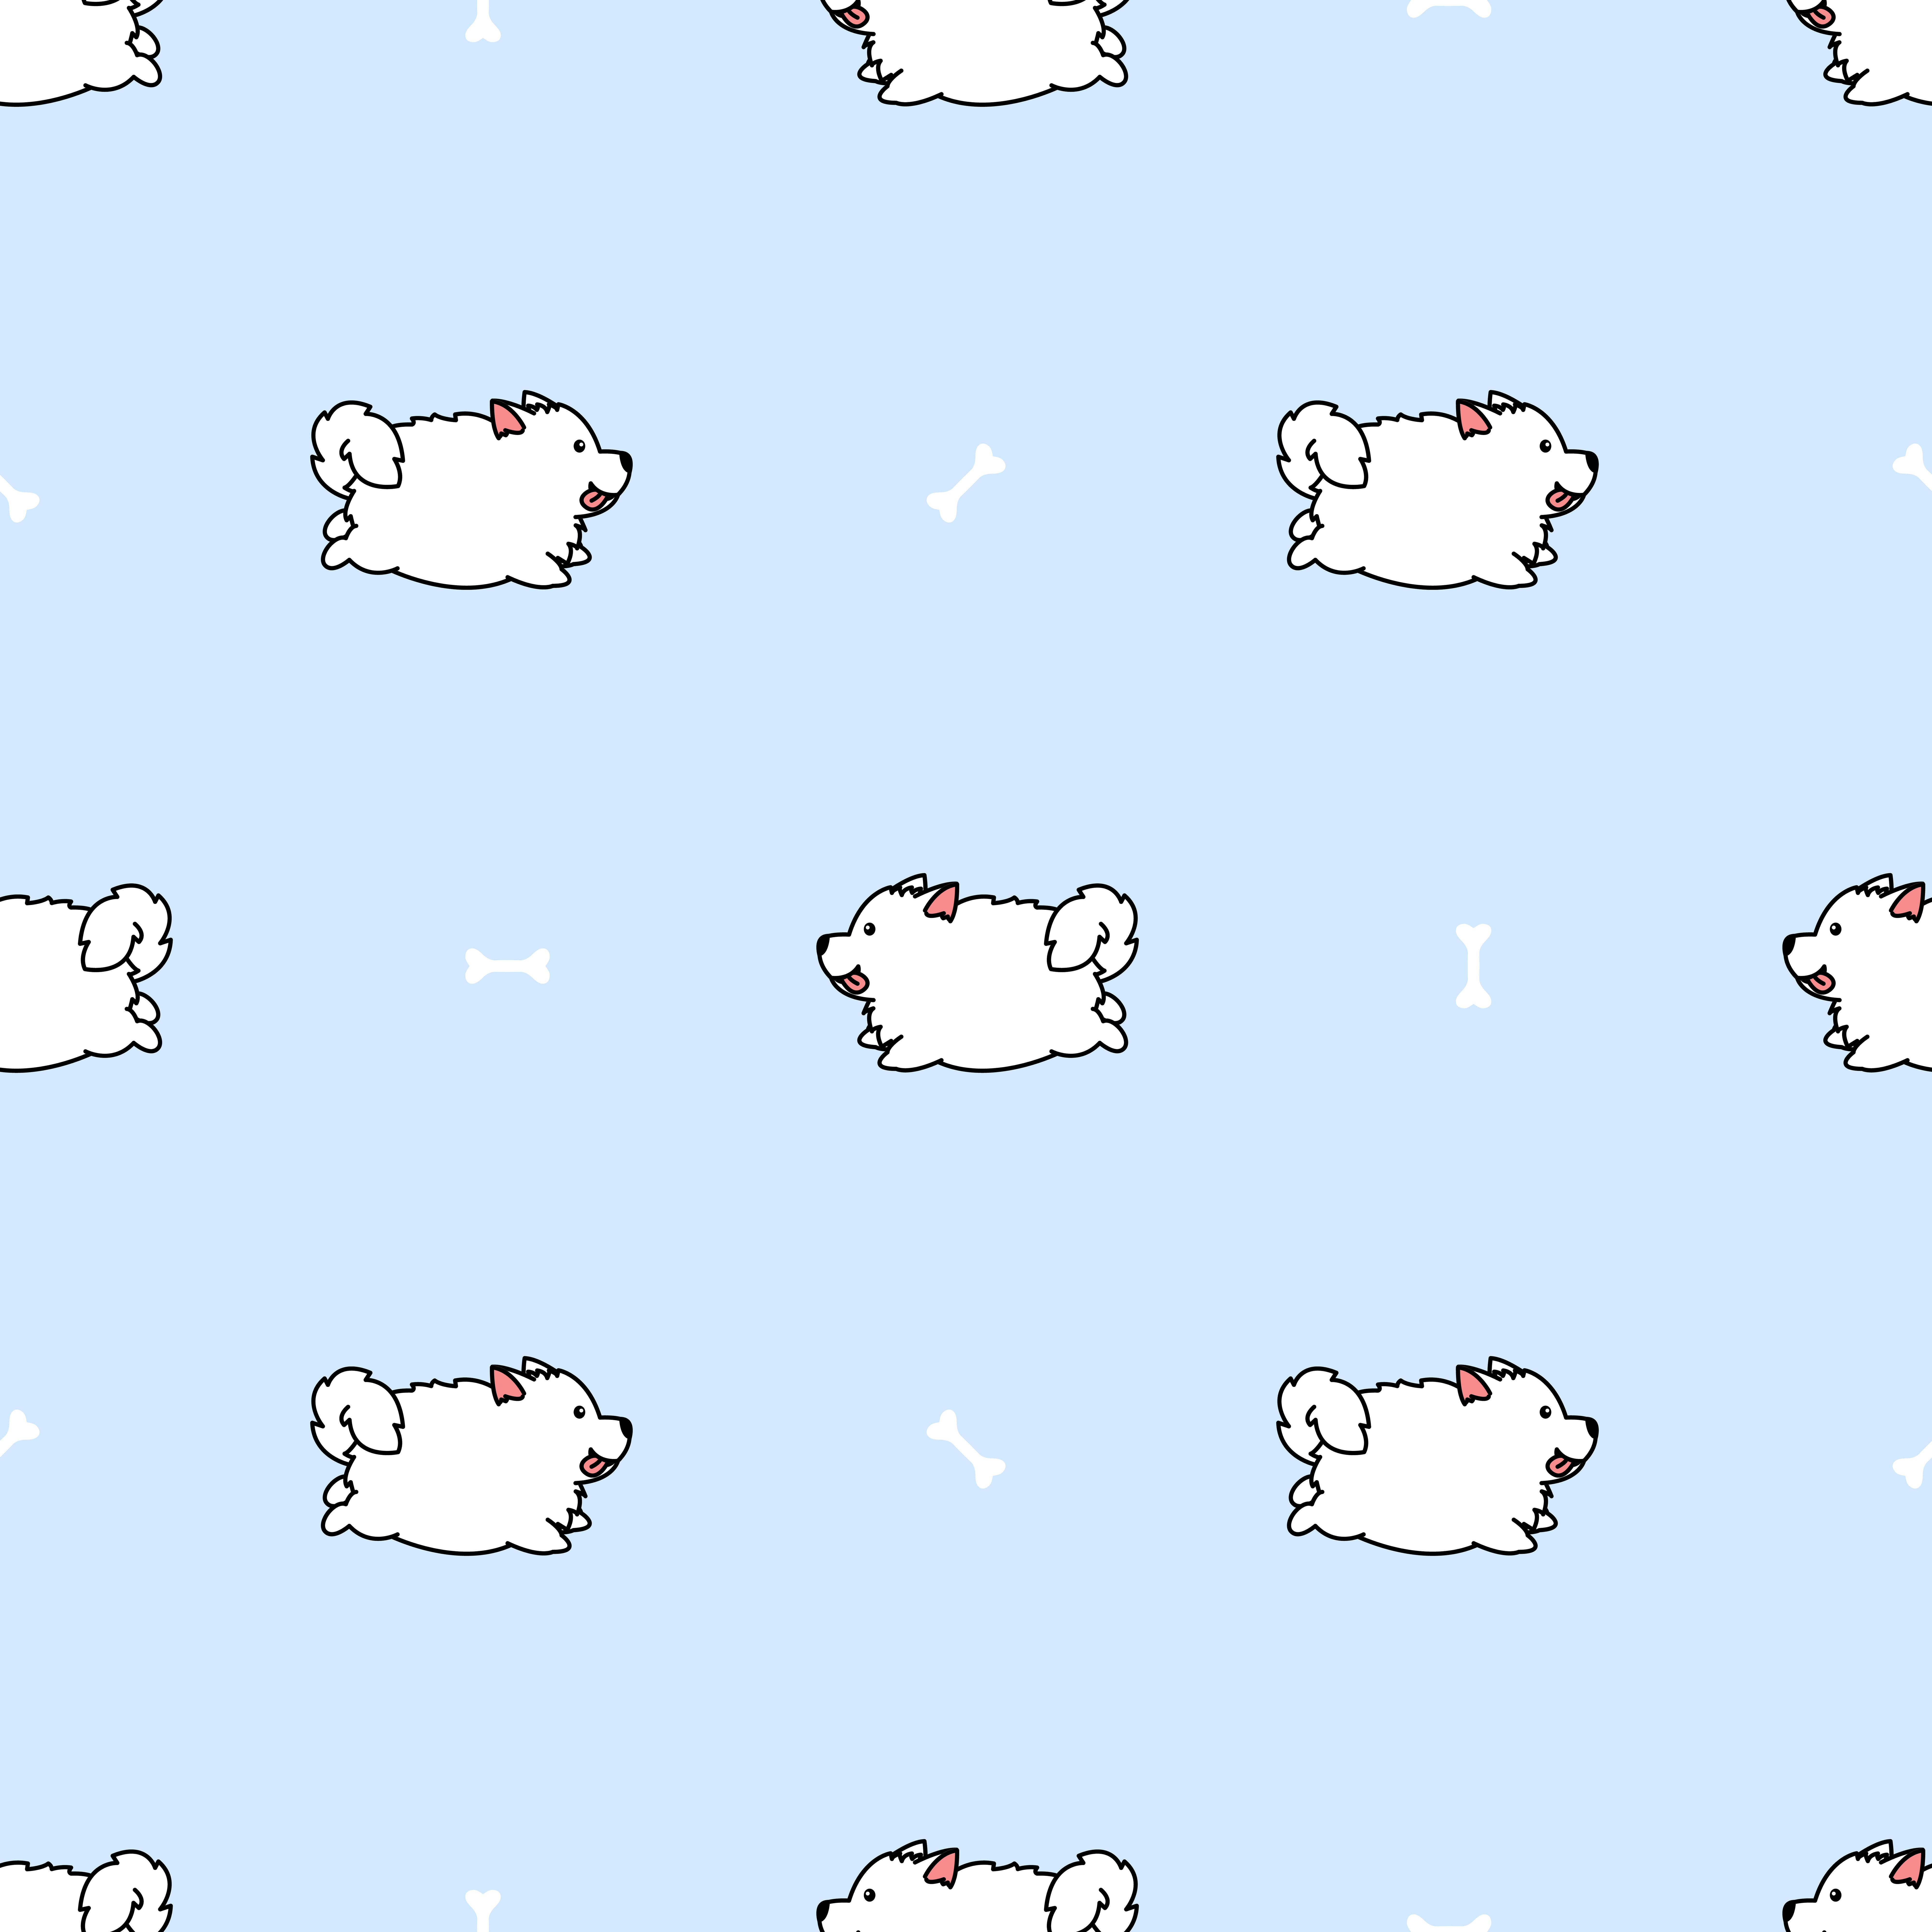 Cute Samoyed Dog Running Cartoon Seamless Pattern Download Free Vectors Clipart Graphics Vector Art